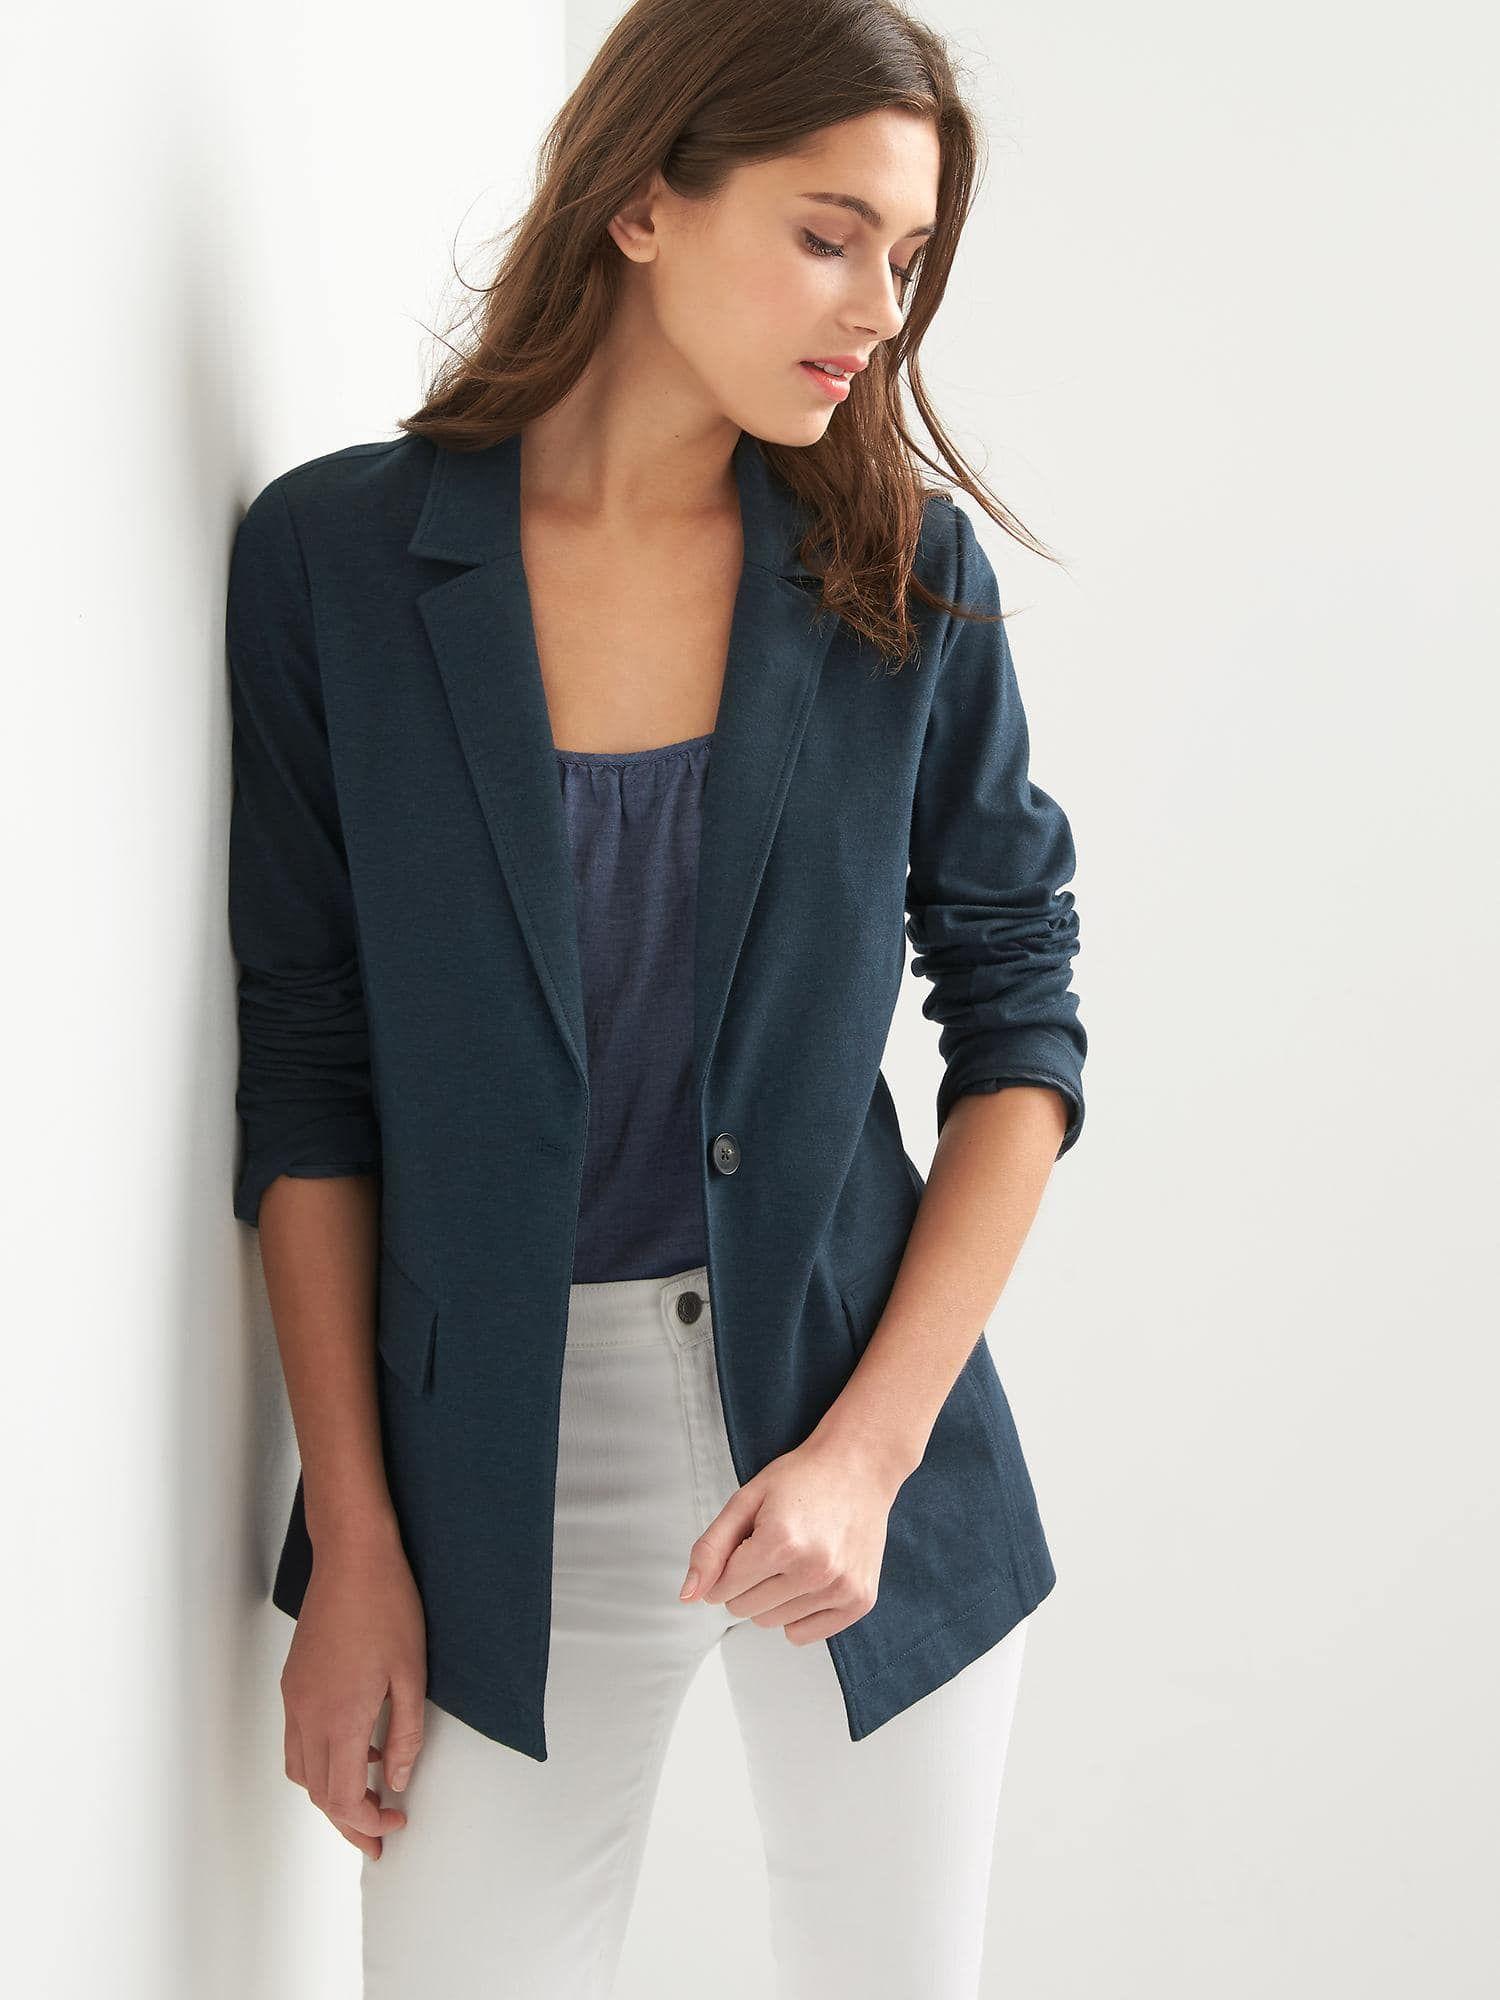 Product Photo Outerwear Women Coats Jackets Women Petite Business Casual [ 2000 x 1500 Pixel ]